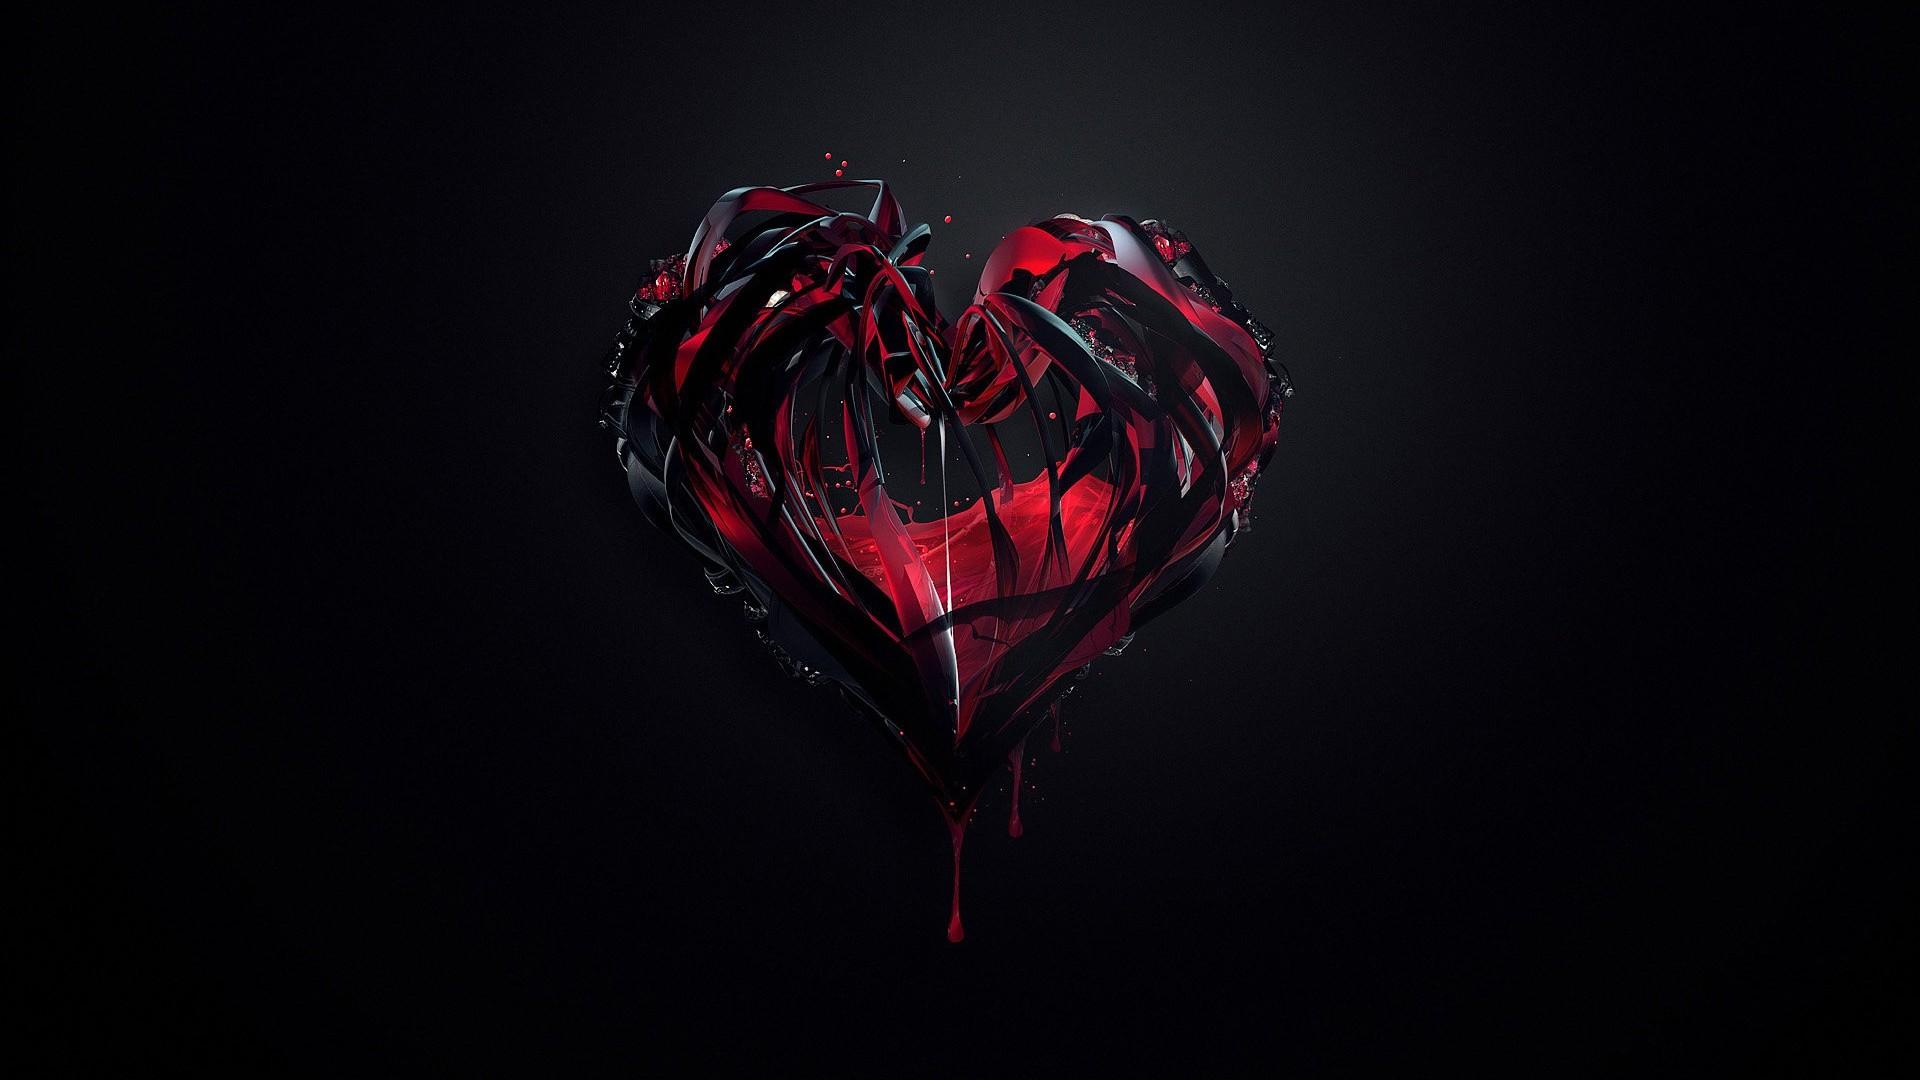 Wallpaper : black, digital art, heart, red, reflection ...